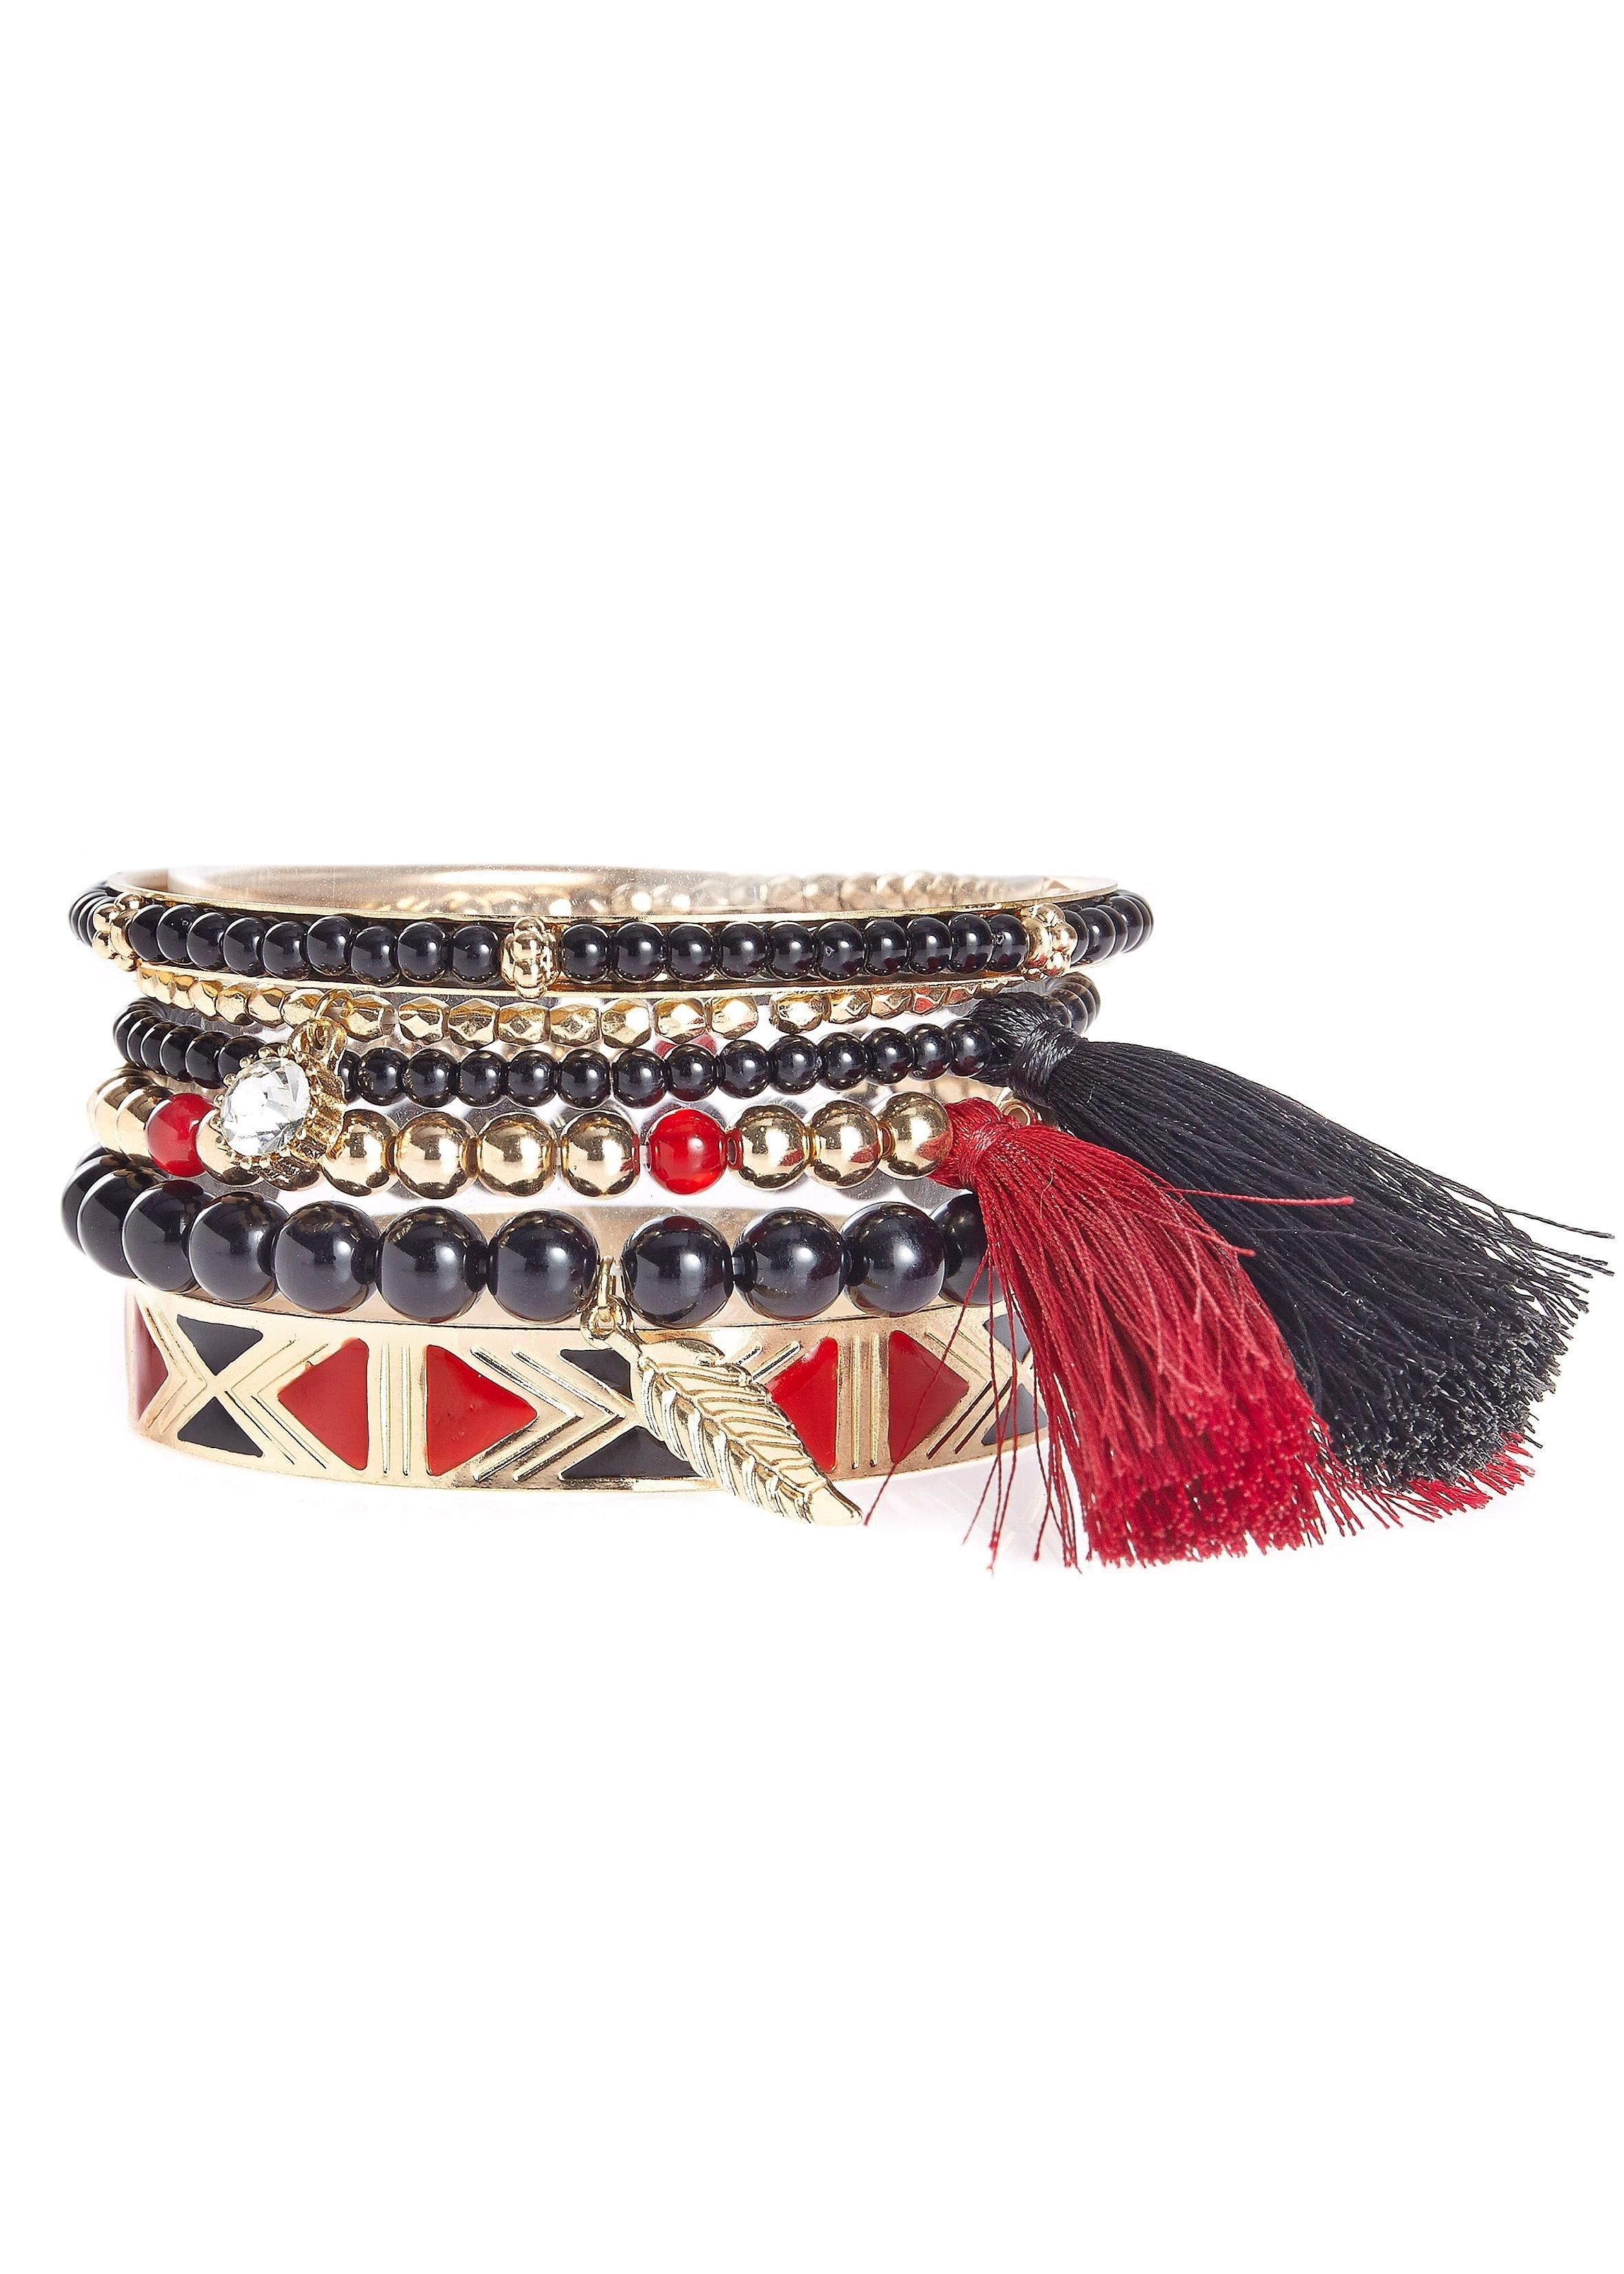 LASCANA armbandenset in de webshop van Lascana kopen